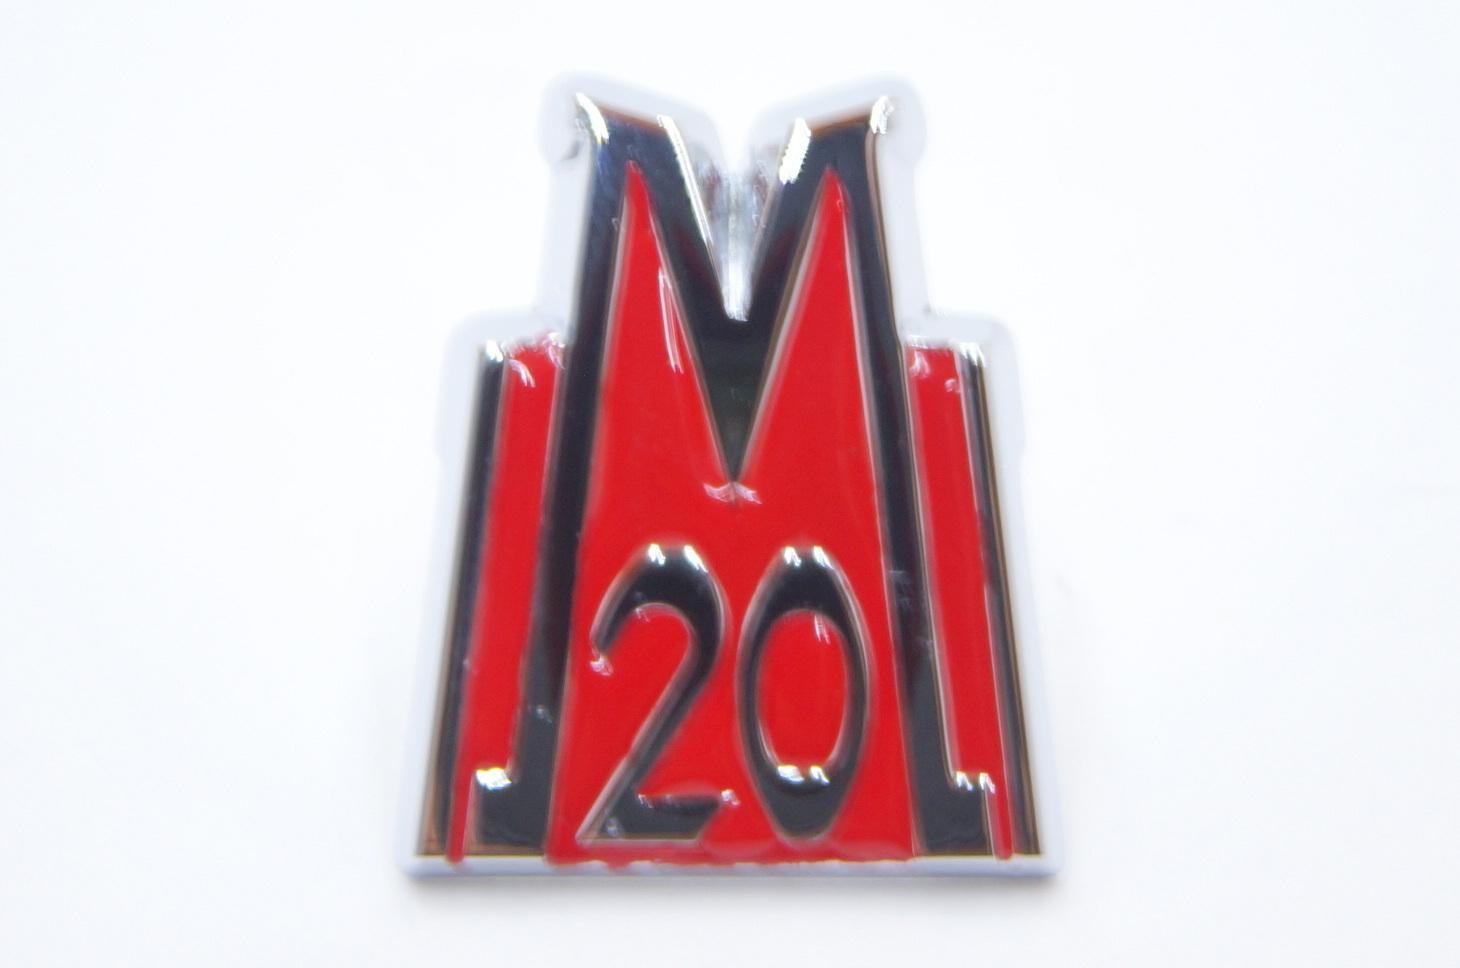 Эмблема панели приборов Газ М20 торпедо